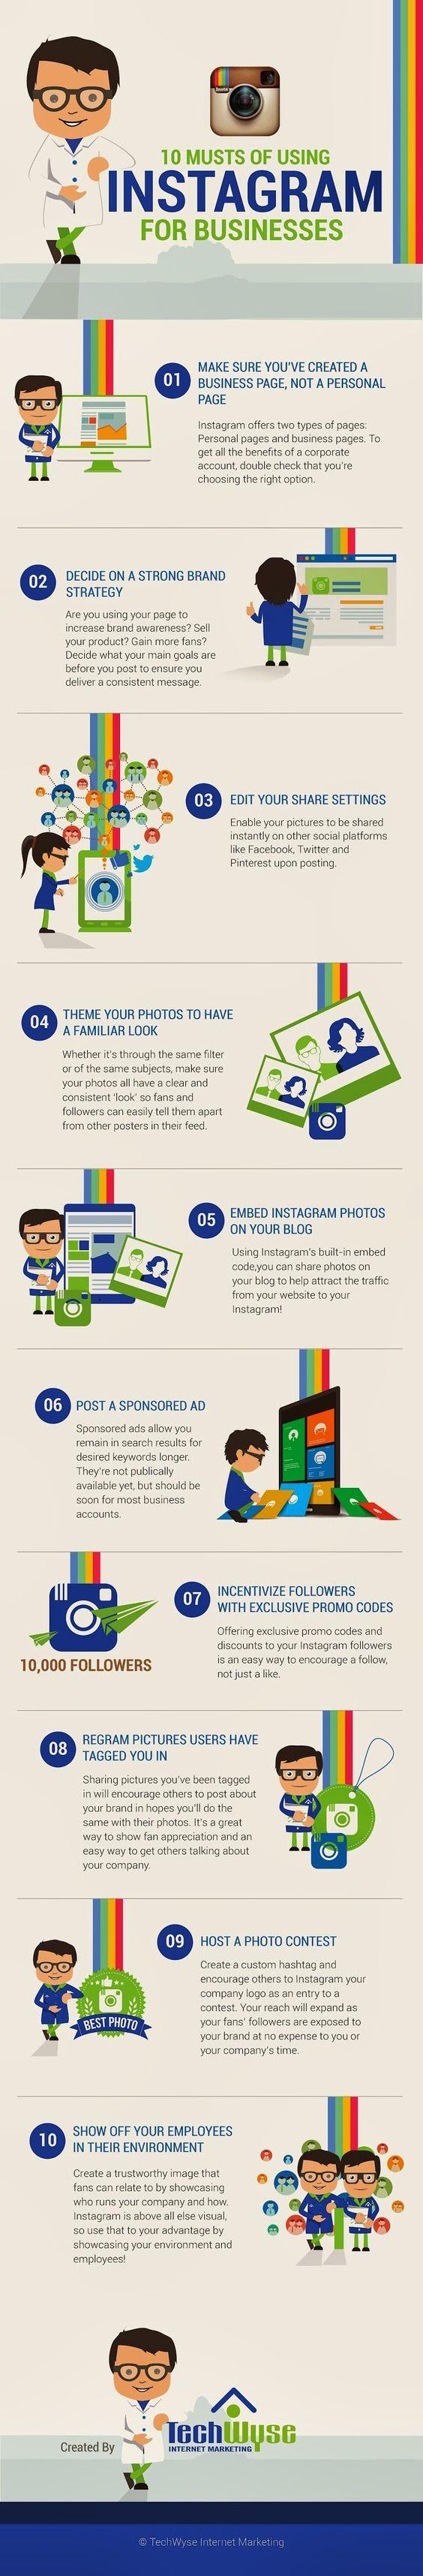 "Instagram for Business: Die 10 wichtigsten ""Musts"" #socialmedia #socialmediamarketing"